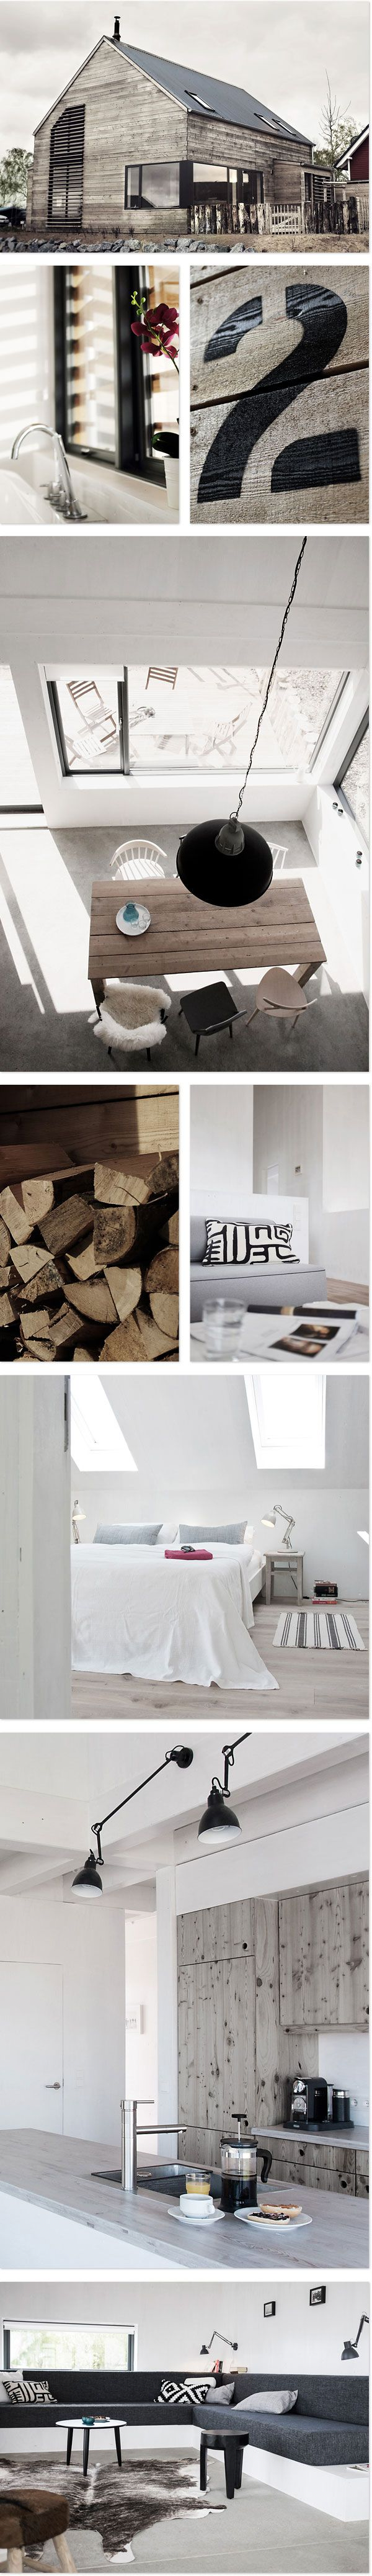 ^ 1000+ images about Haus on Pinterest Pergolas, Verandas and ...